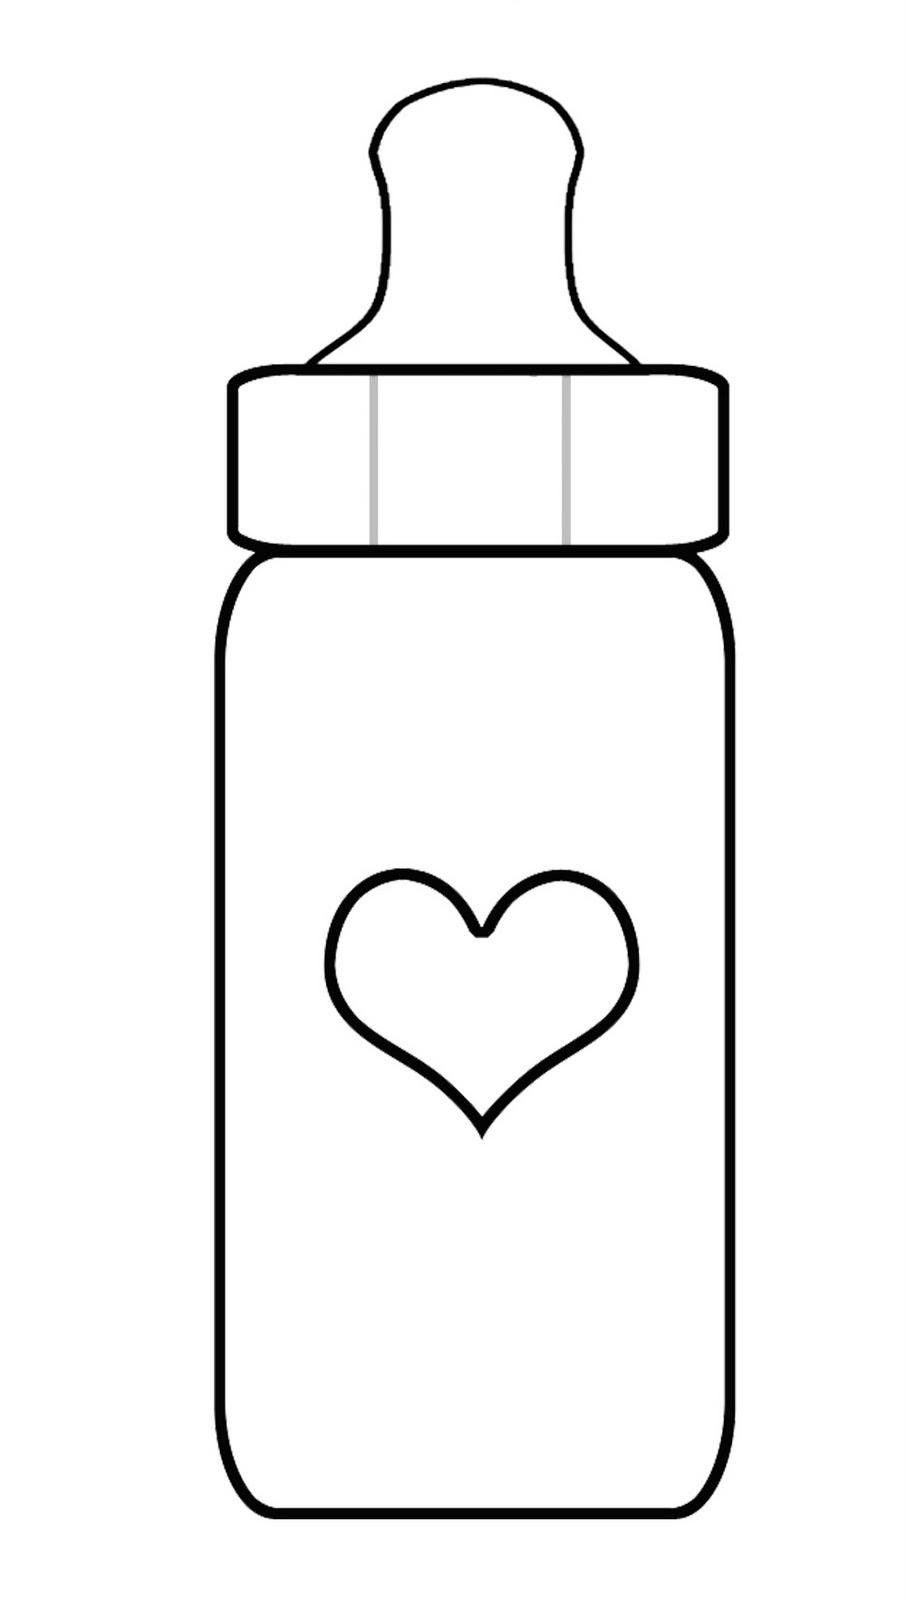 Bottle Outline Template.